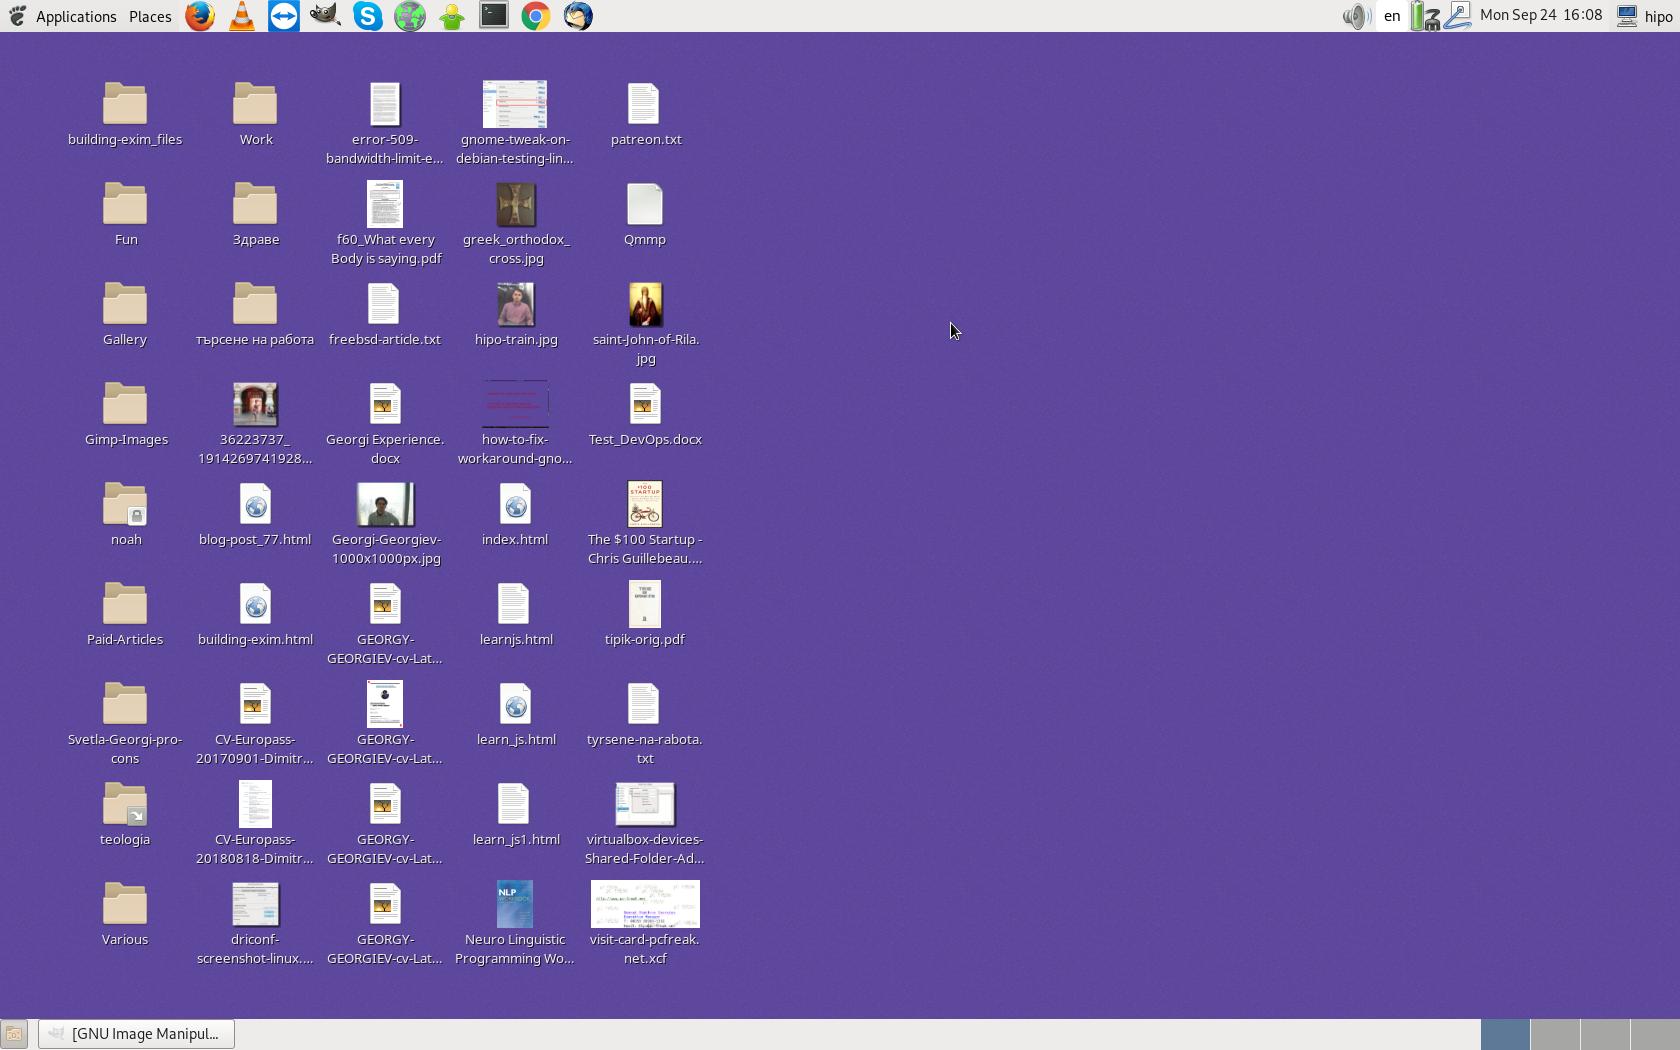 classic-gnome-flashback-debian-gnu-linux-hipos-desktop-screenshot